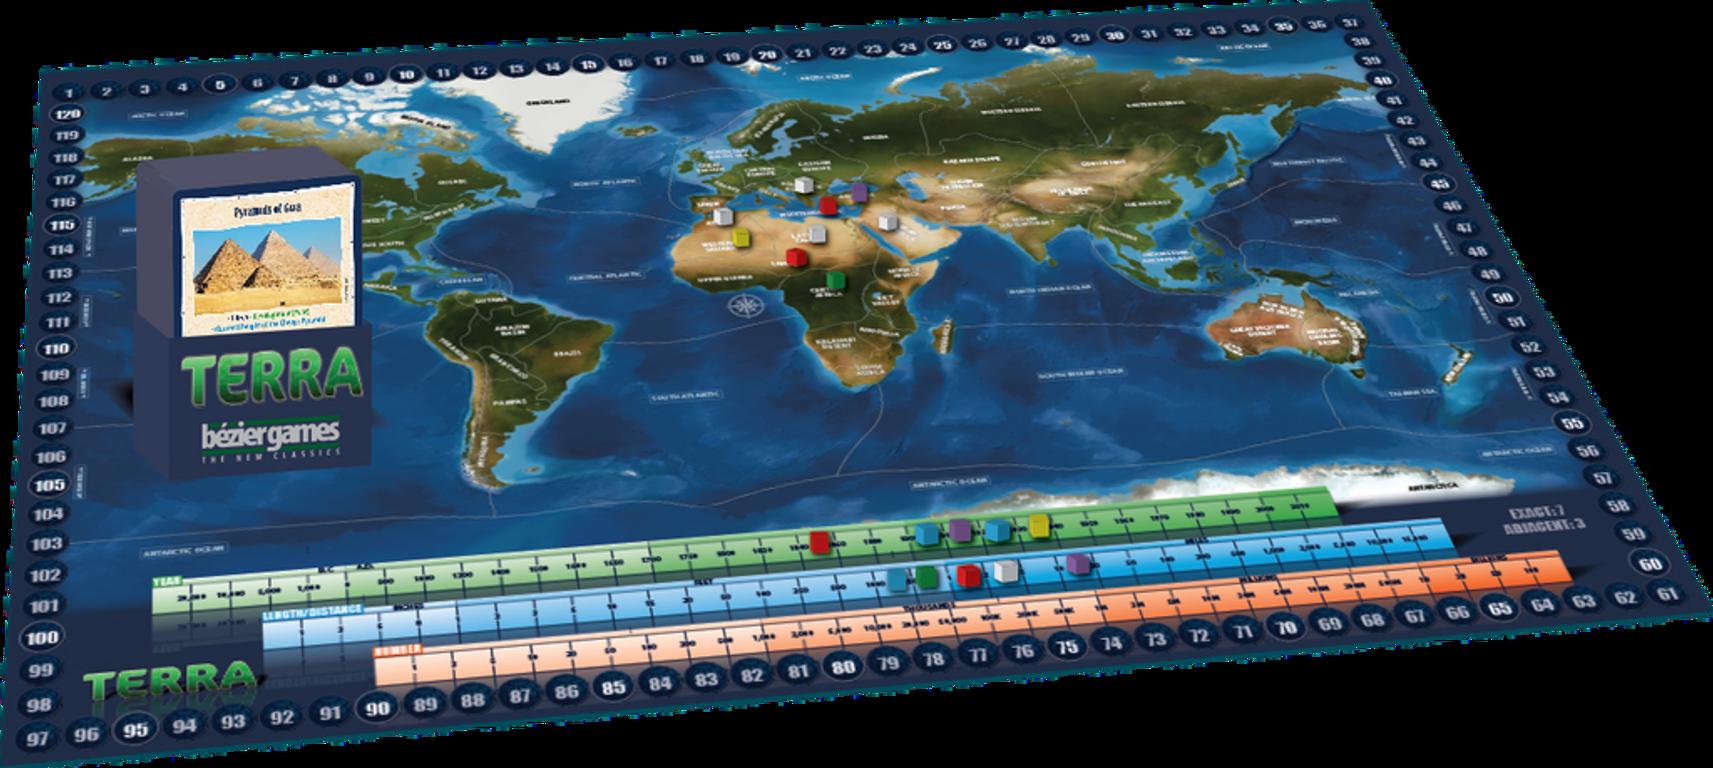 Terra game board